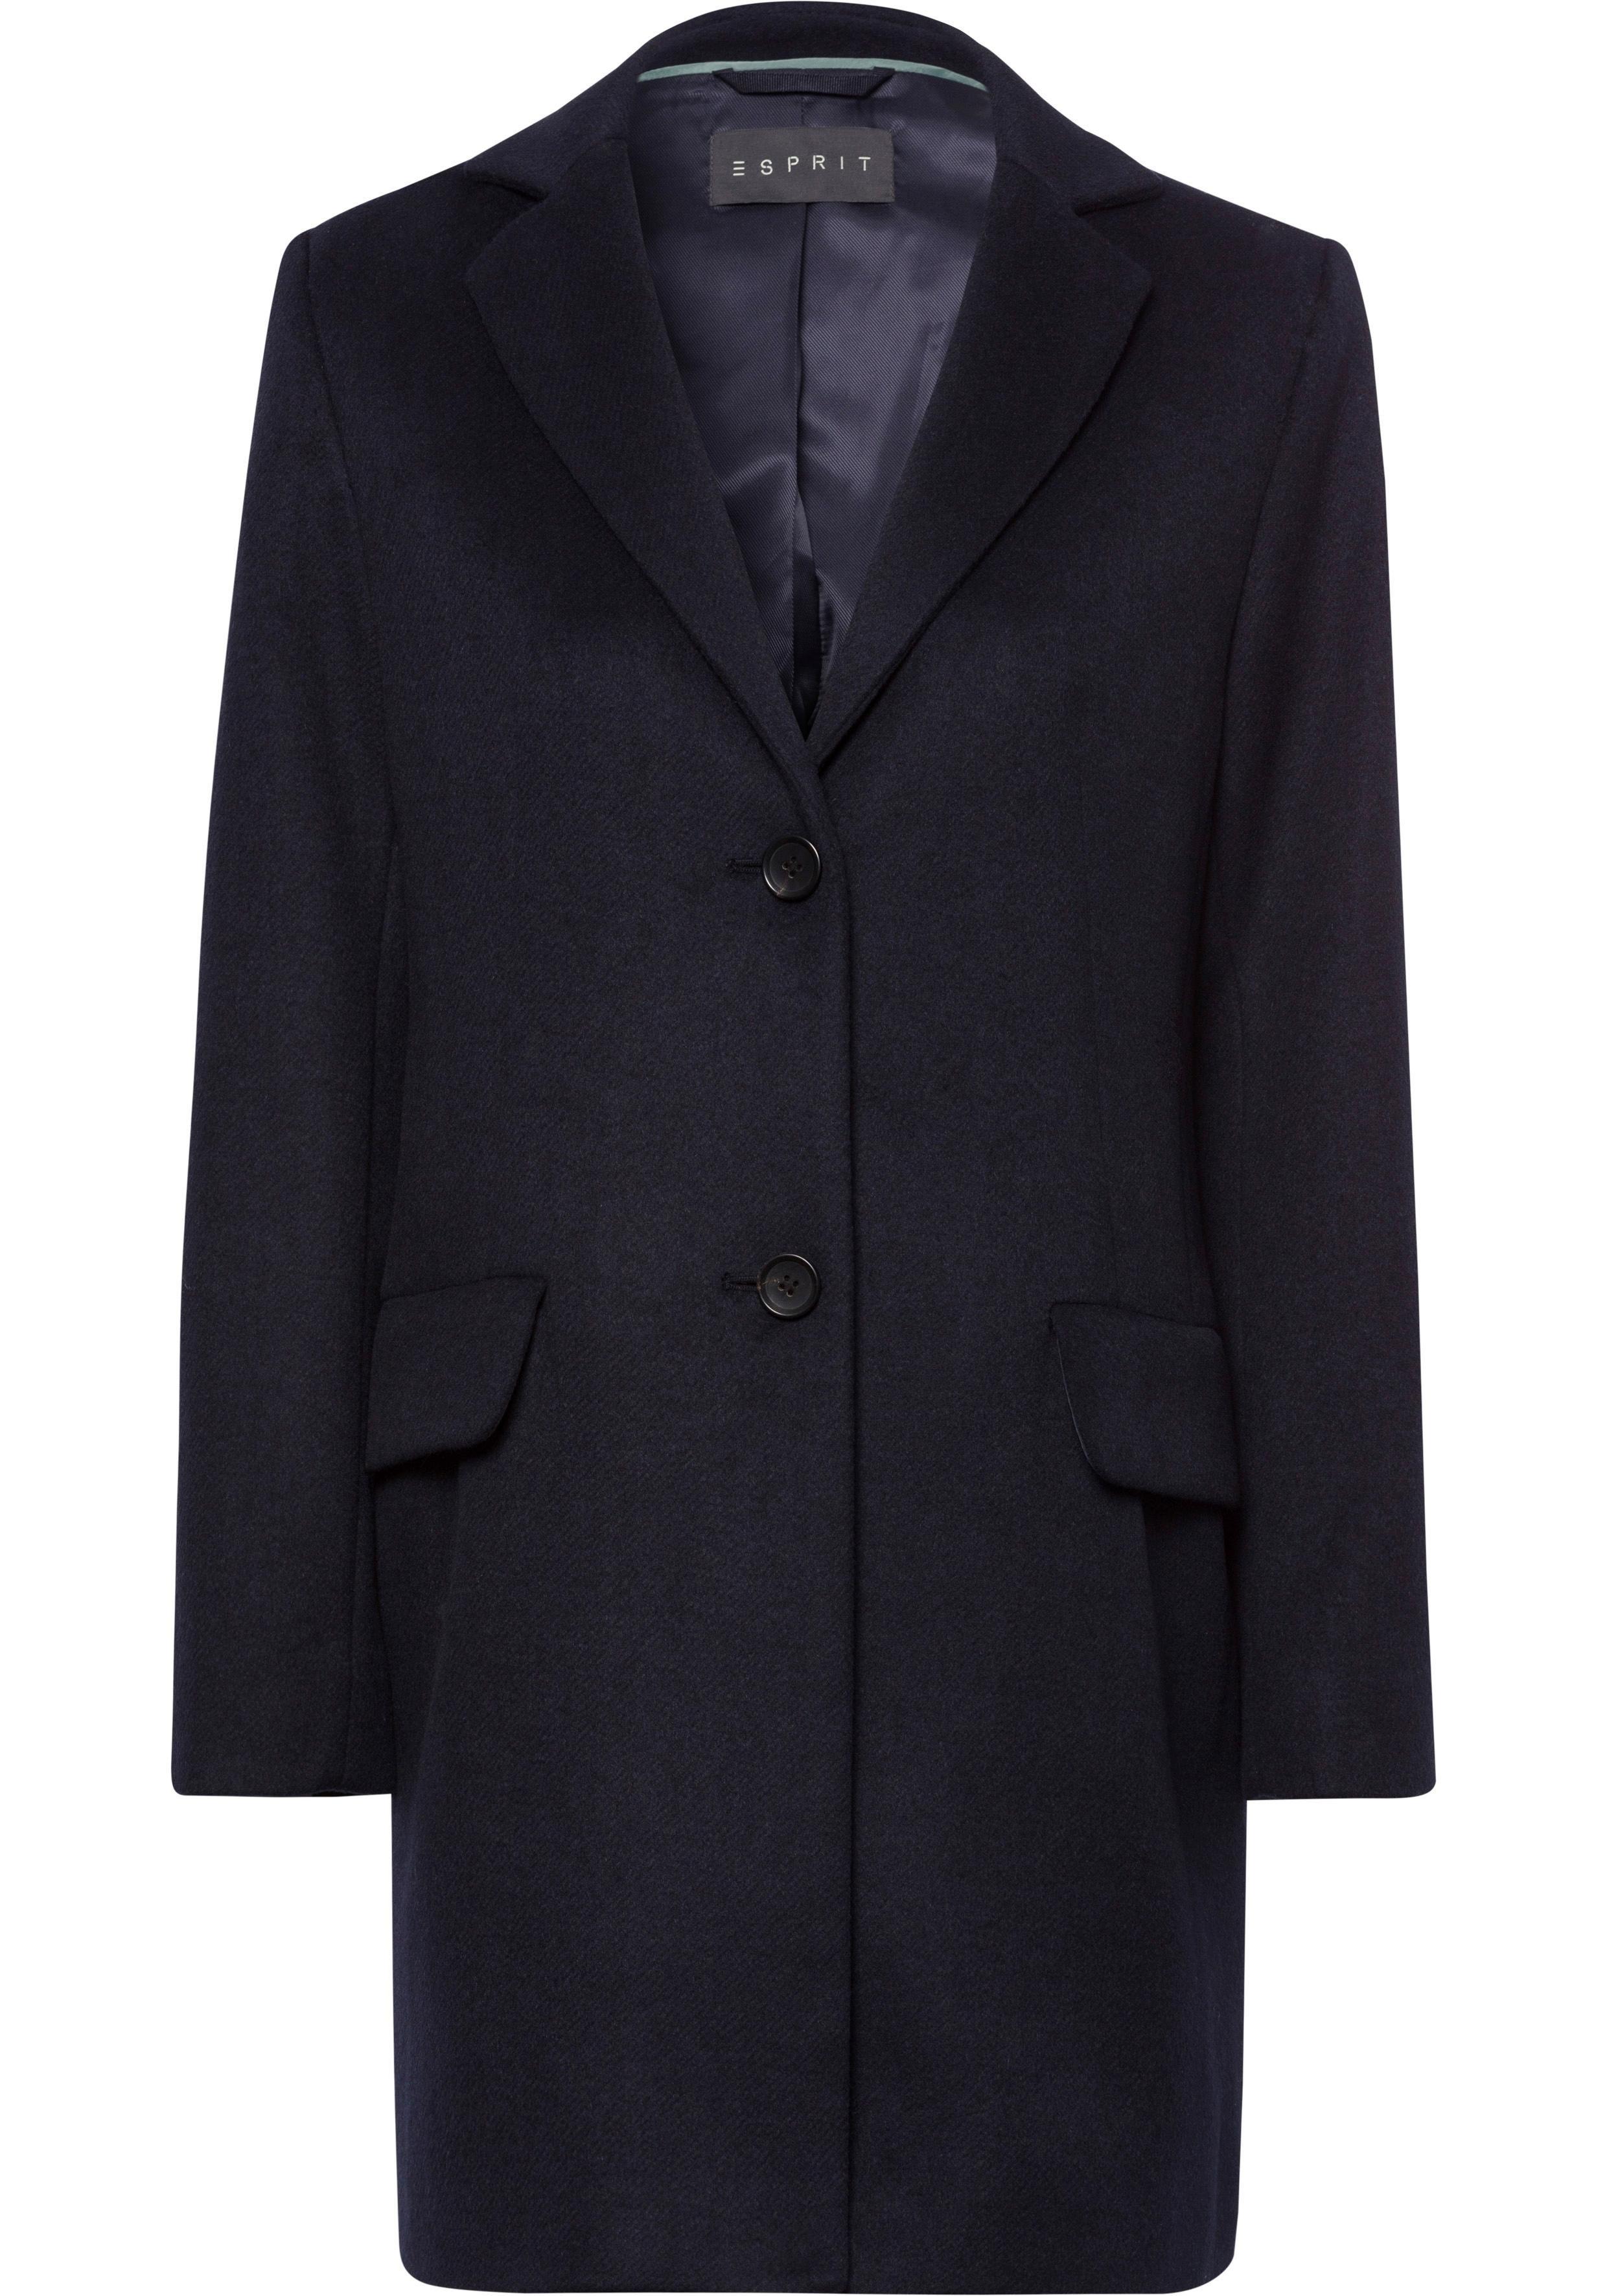 Esprit Collection lange jas - gratis ruilen op otto.nl